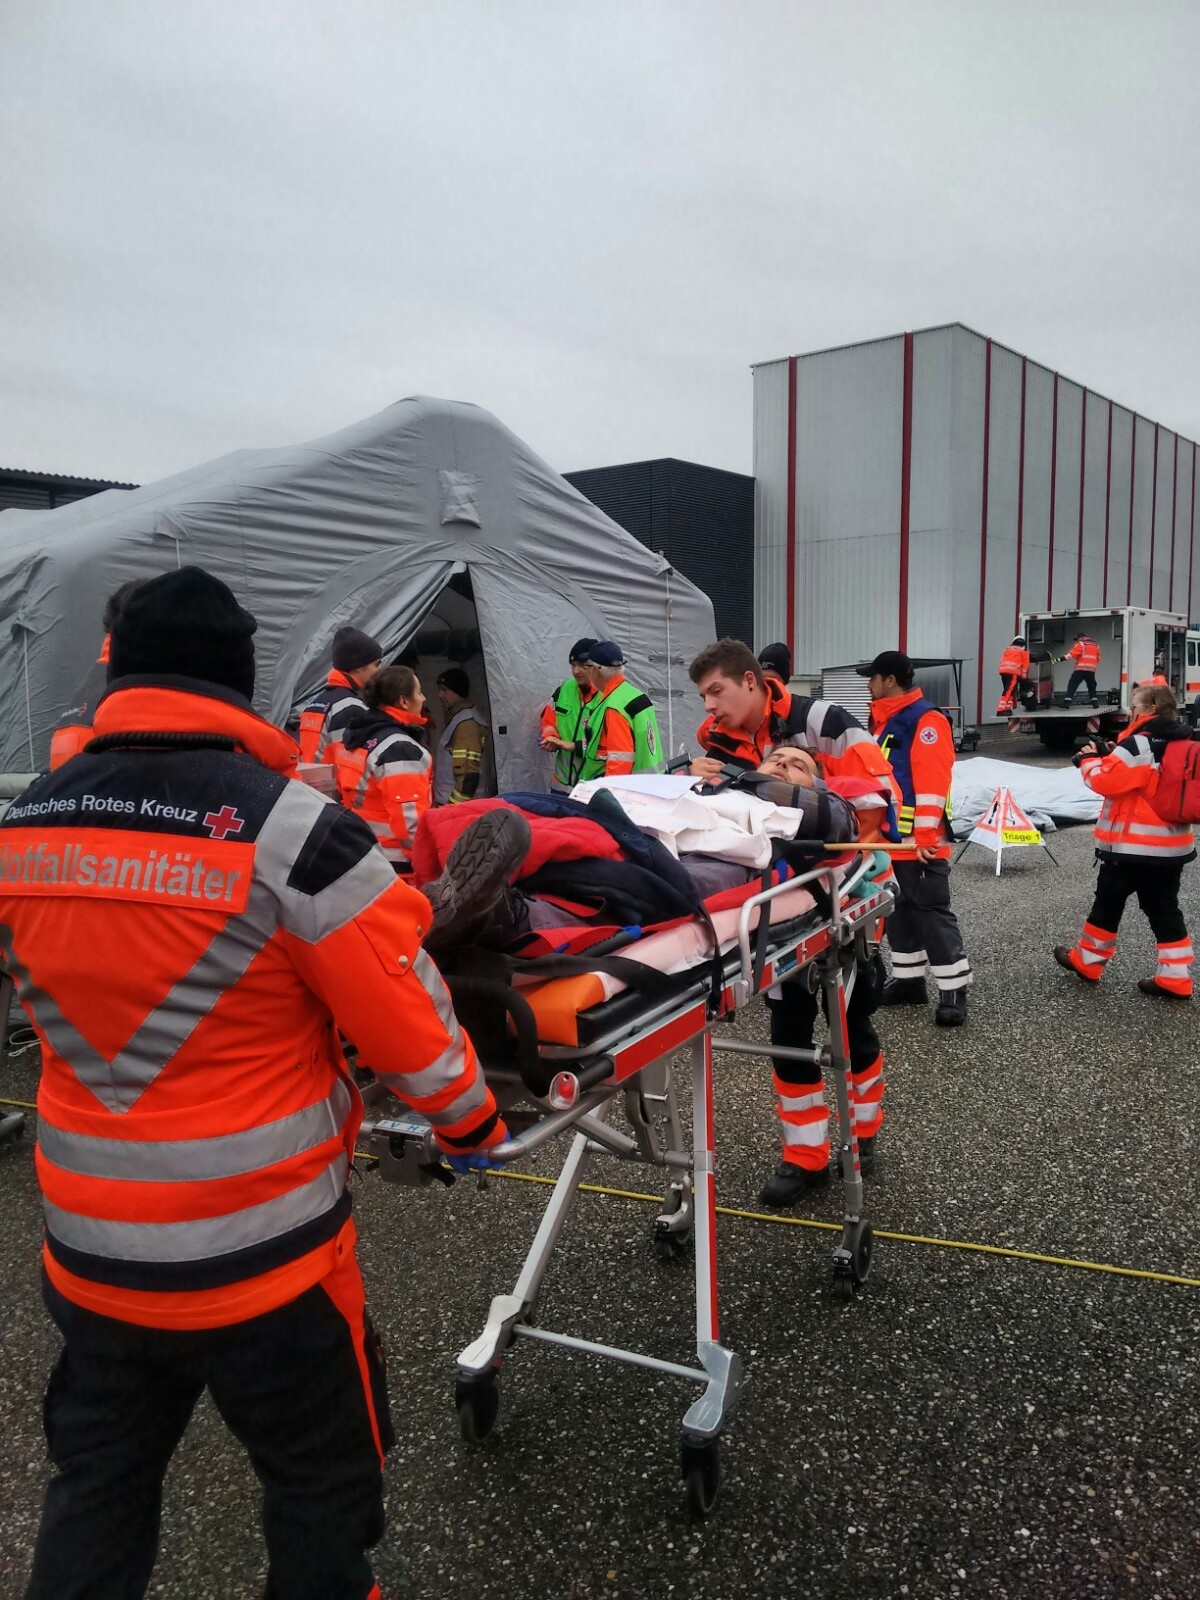 81a133cace006a Meldung - DRK LV Badisches Rotes Kreuz